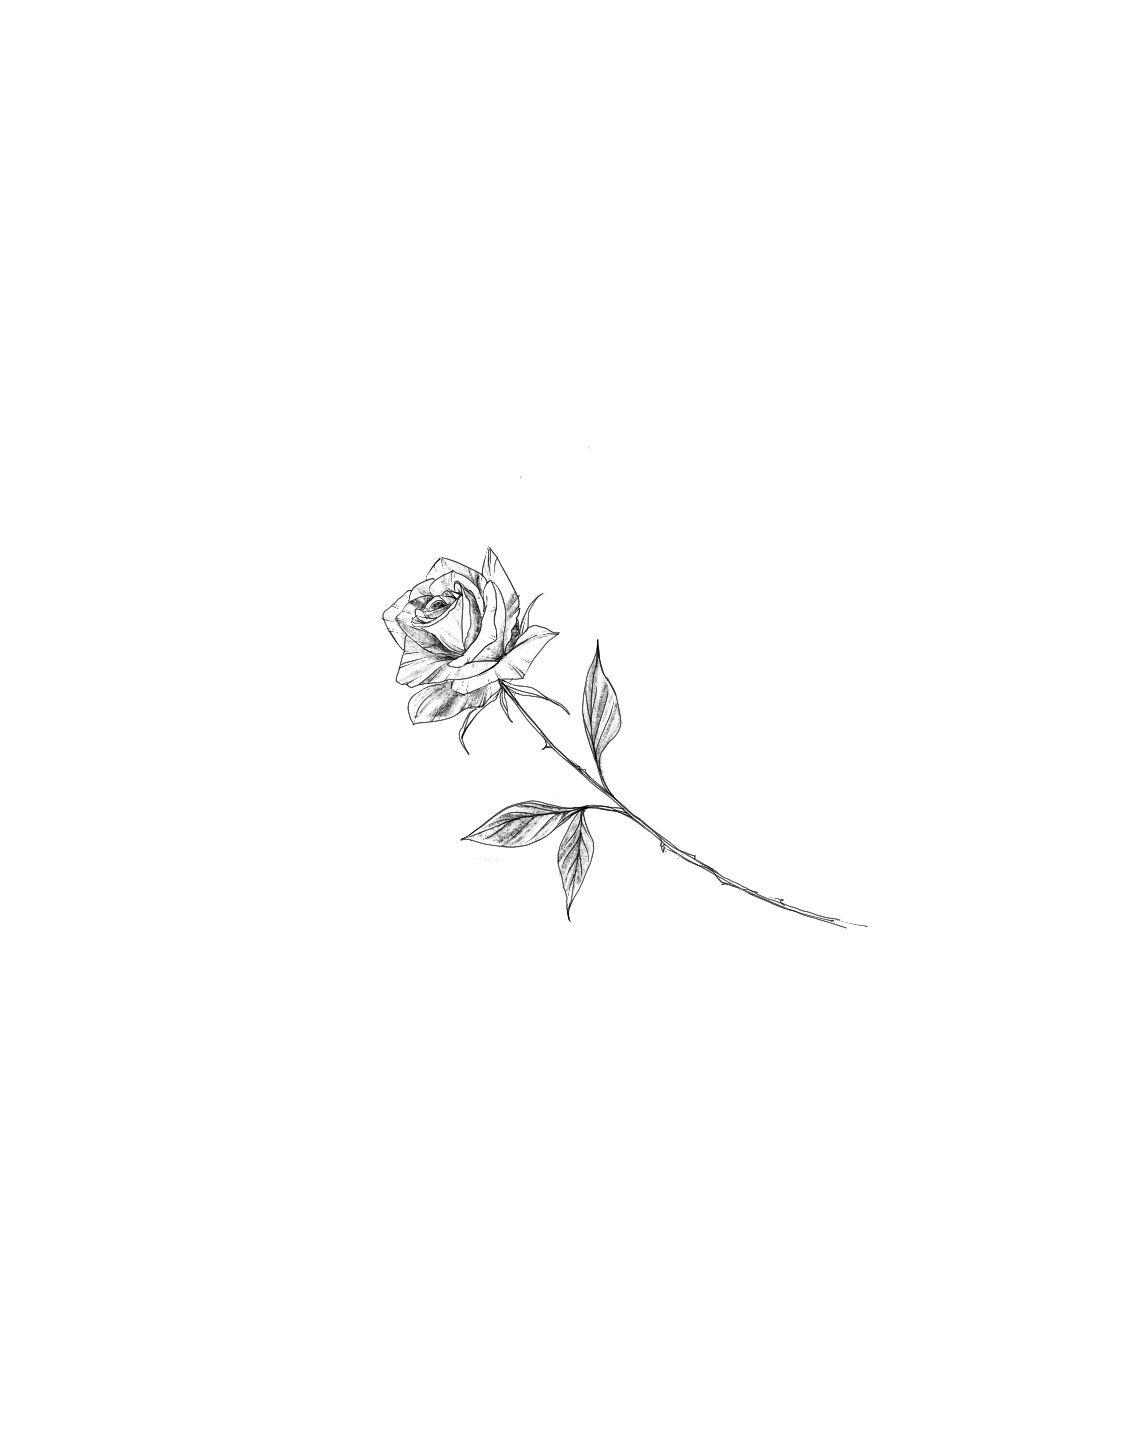 Rose Tattoo Design Rose Tattoo Design Simple Rose Tattoo Small Rose Tattoo